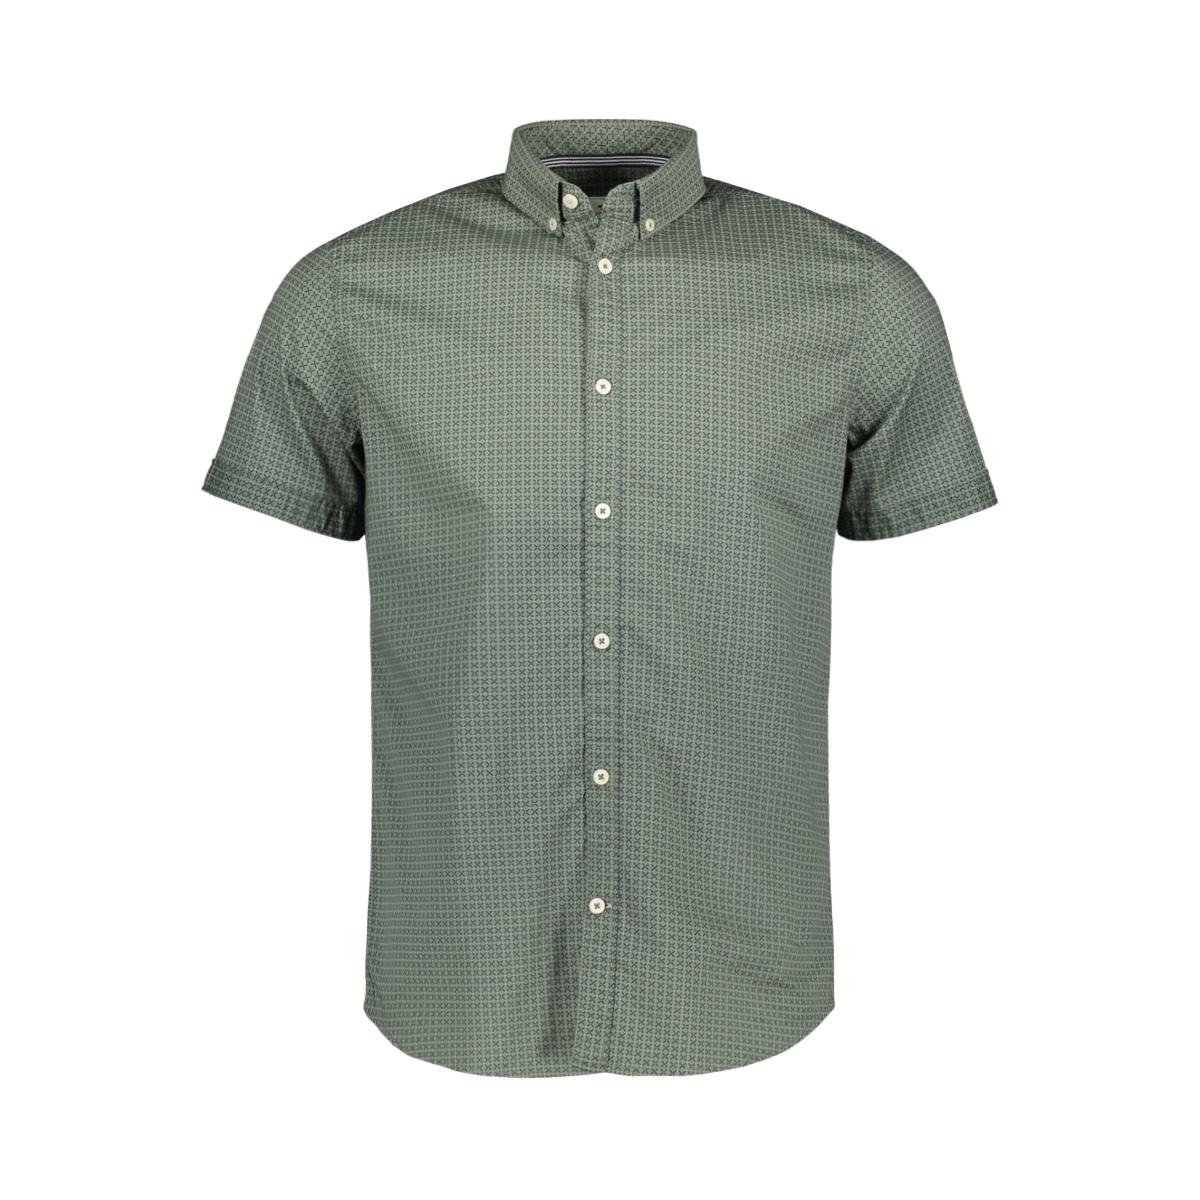 overhemd met korte mouwen 1020622xx10 tom tailor overhemd 22298